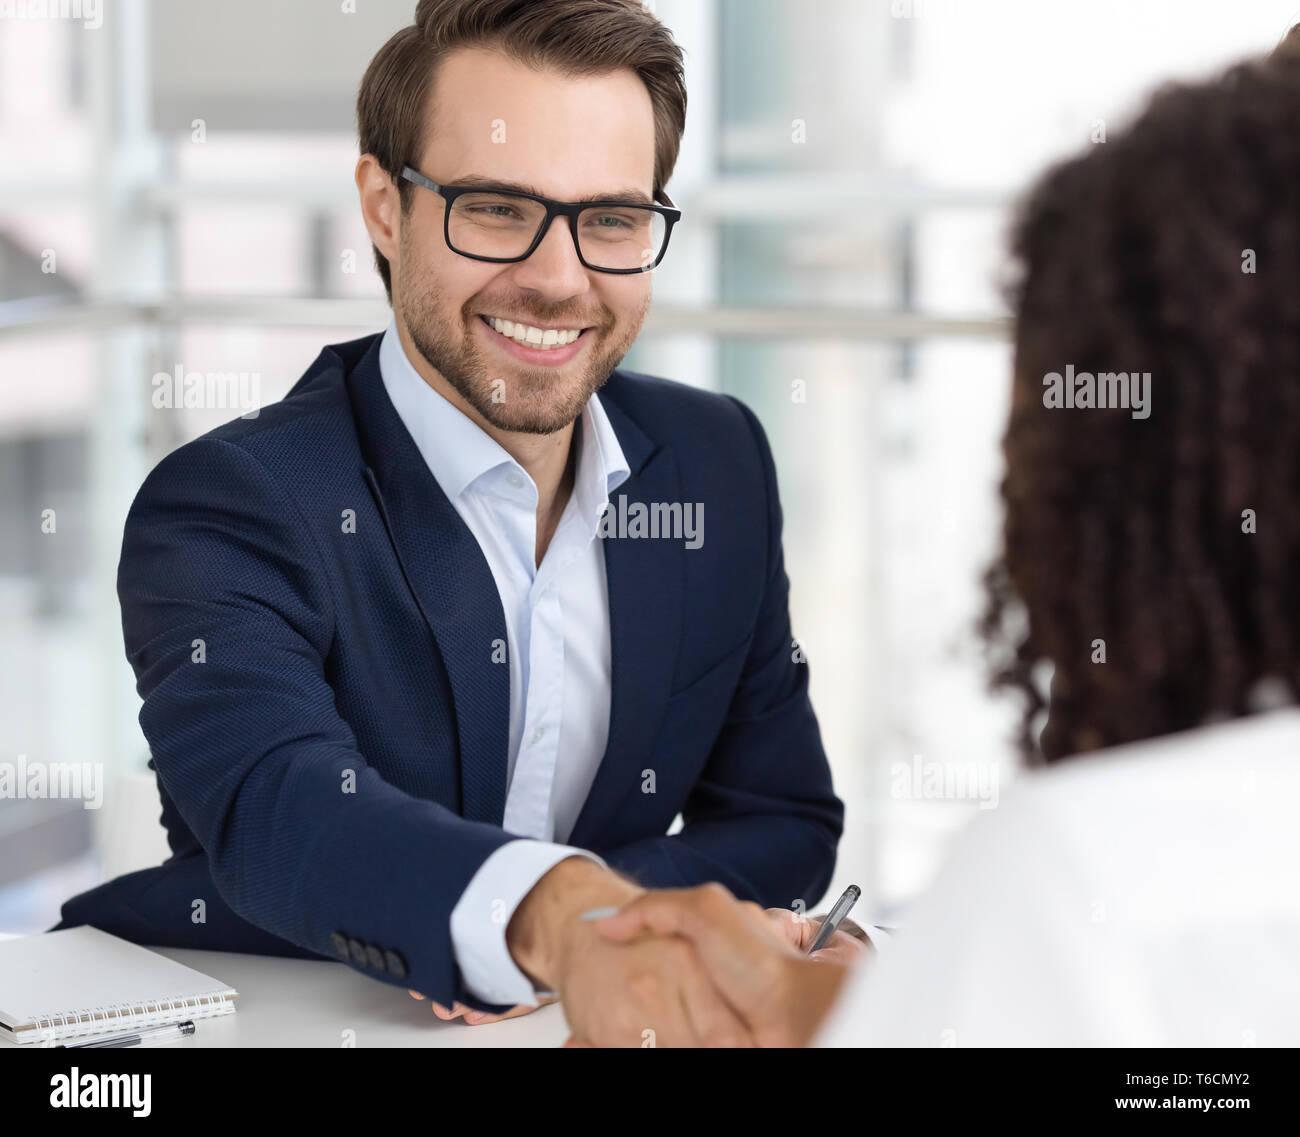 Happy businessman boss hr handshake client candidate make deal hiring - Stock Image